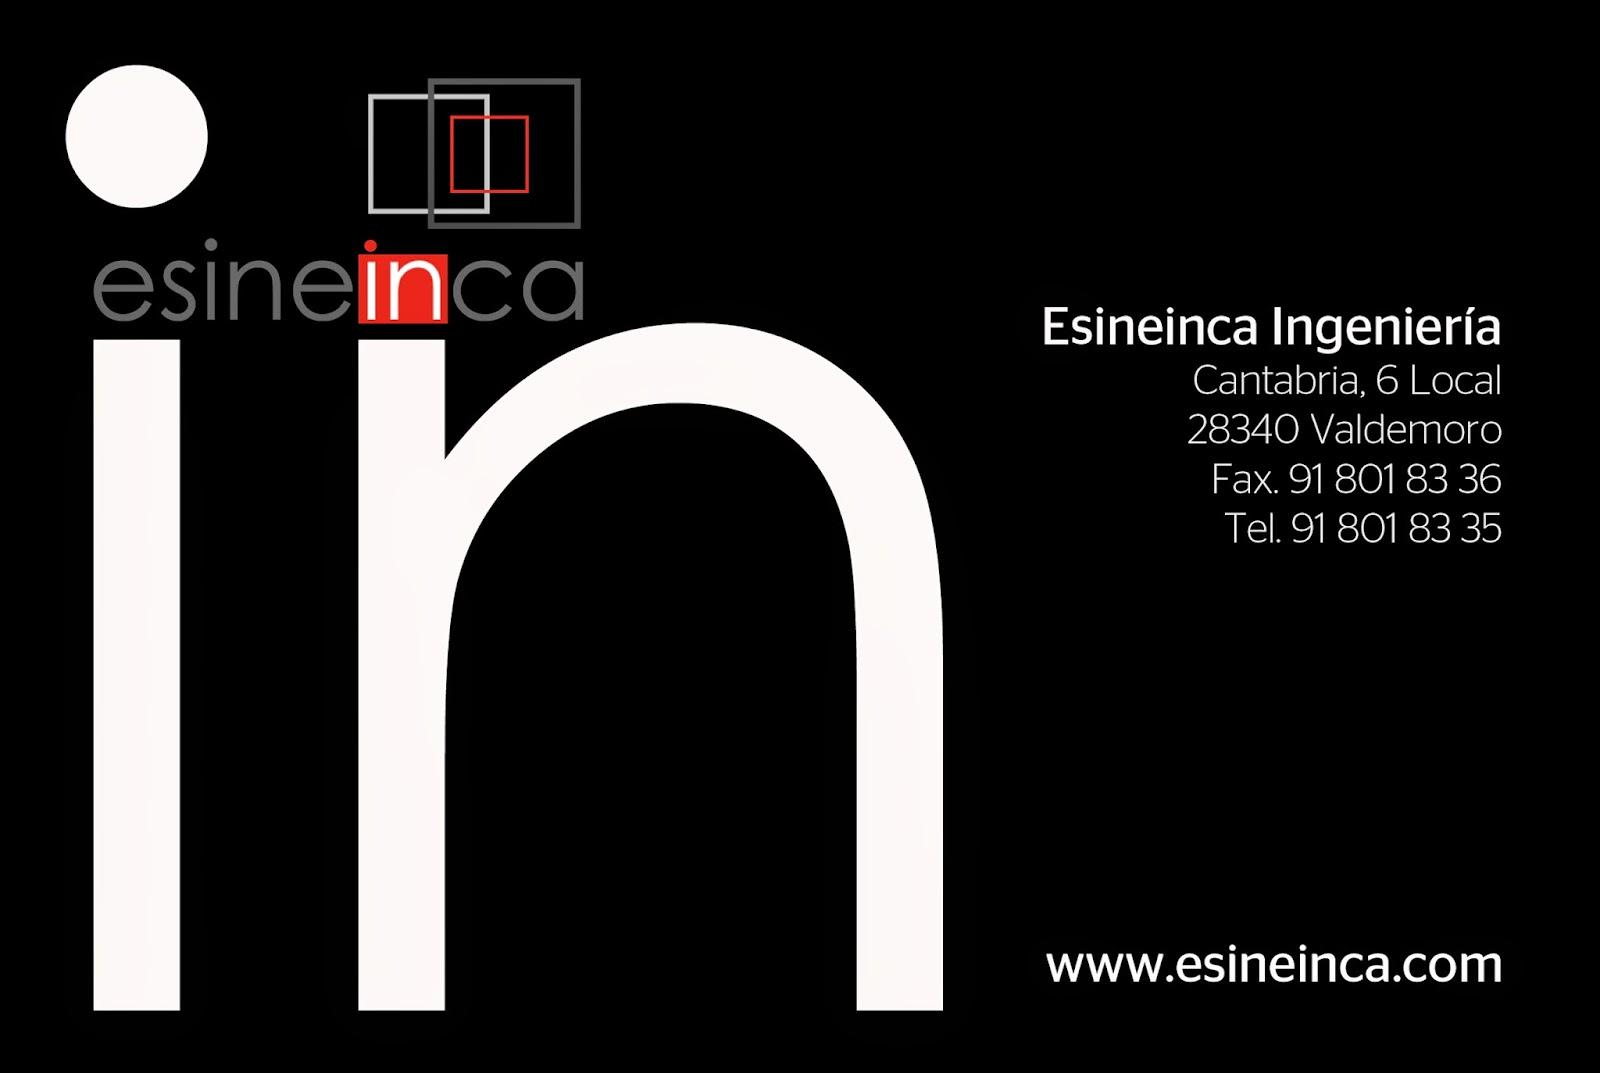 Elegant Genricajpg With Licencias Apertura Madrid